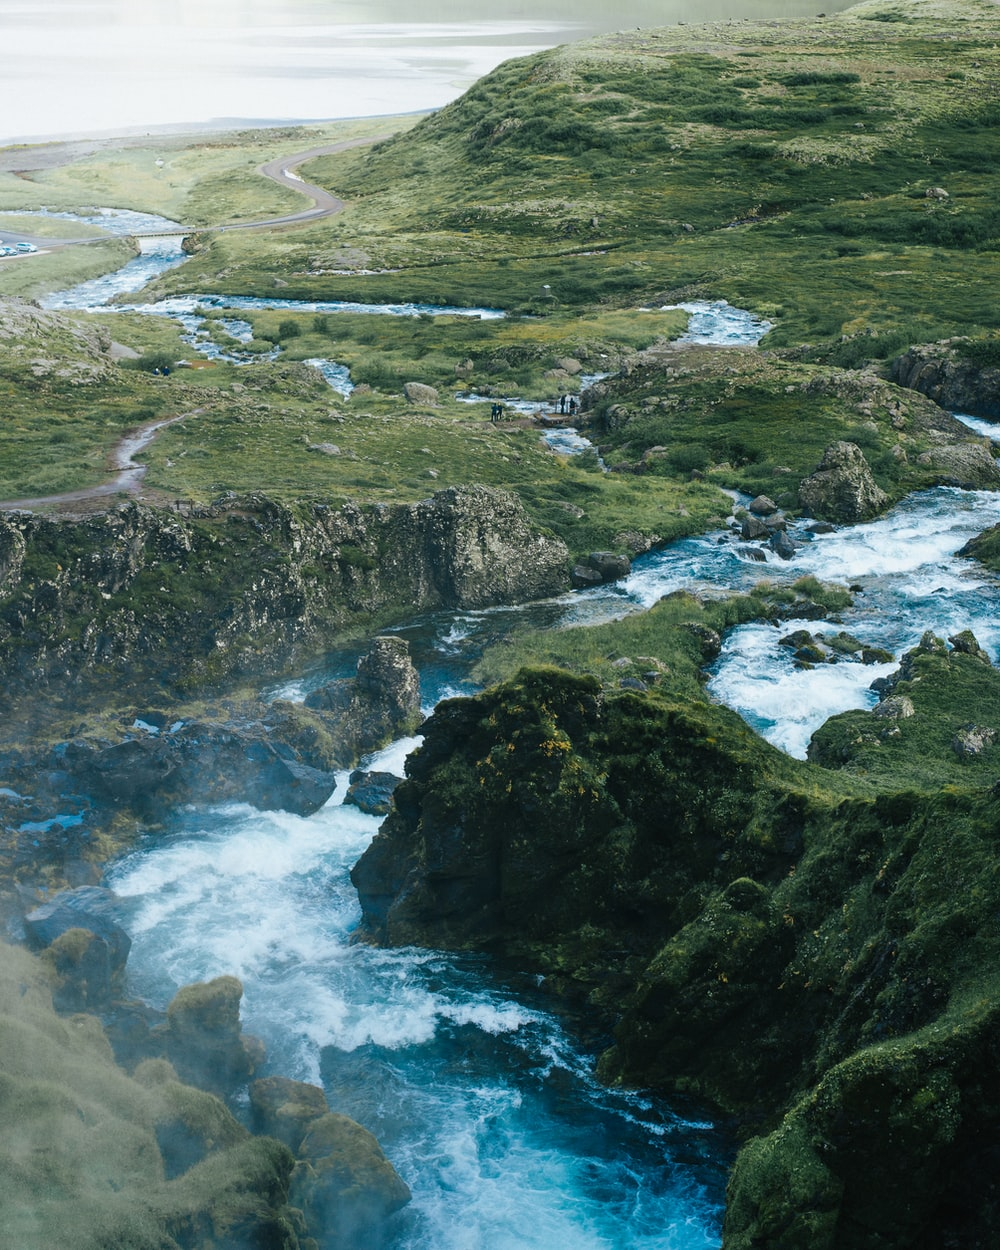 mountain ranges surrounding body of water